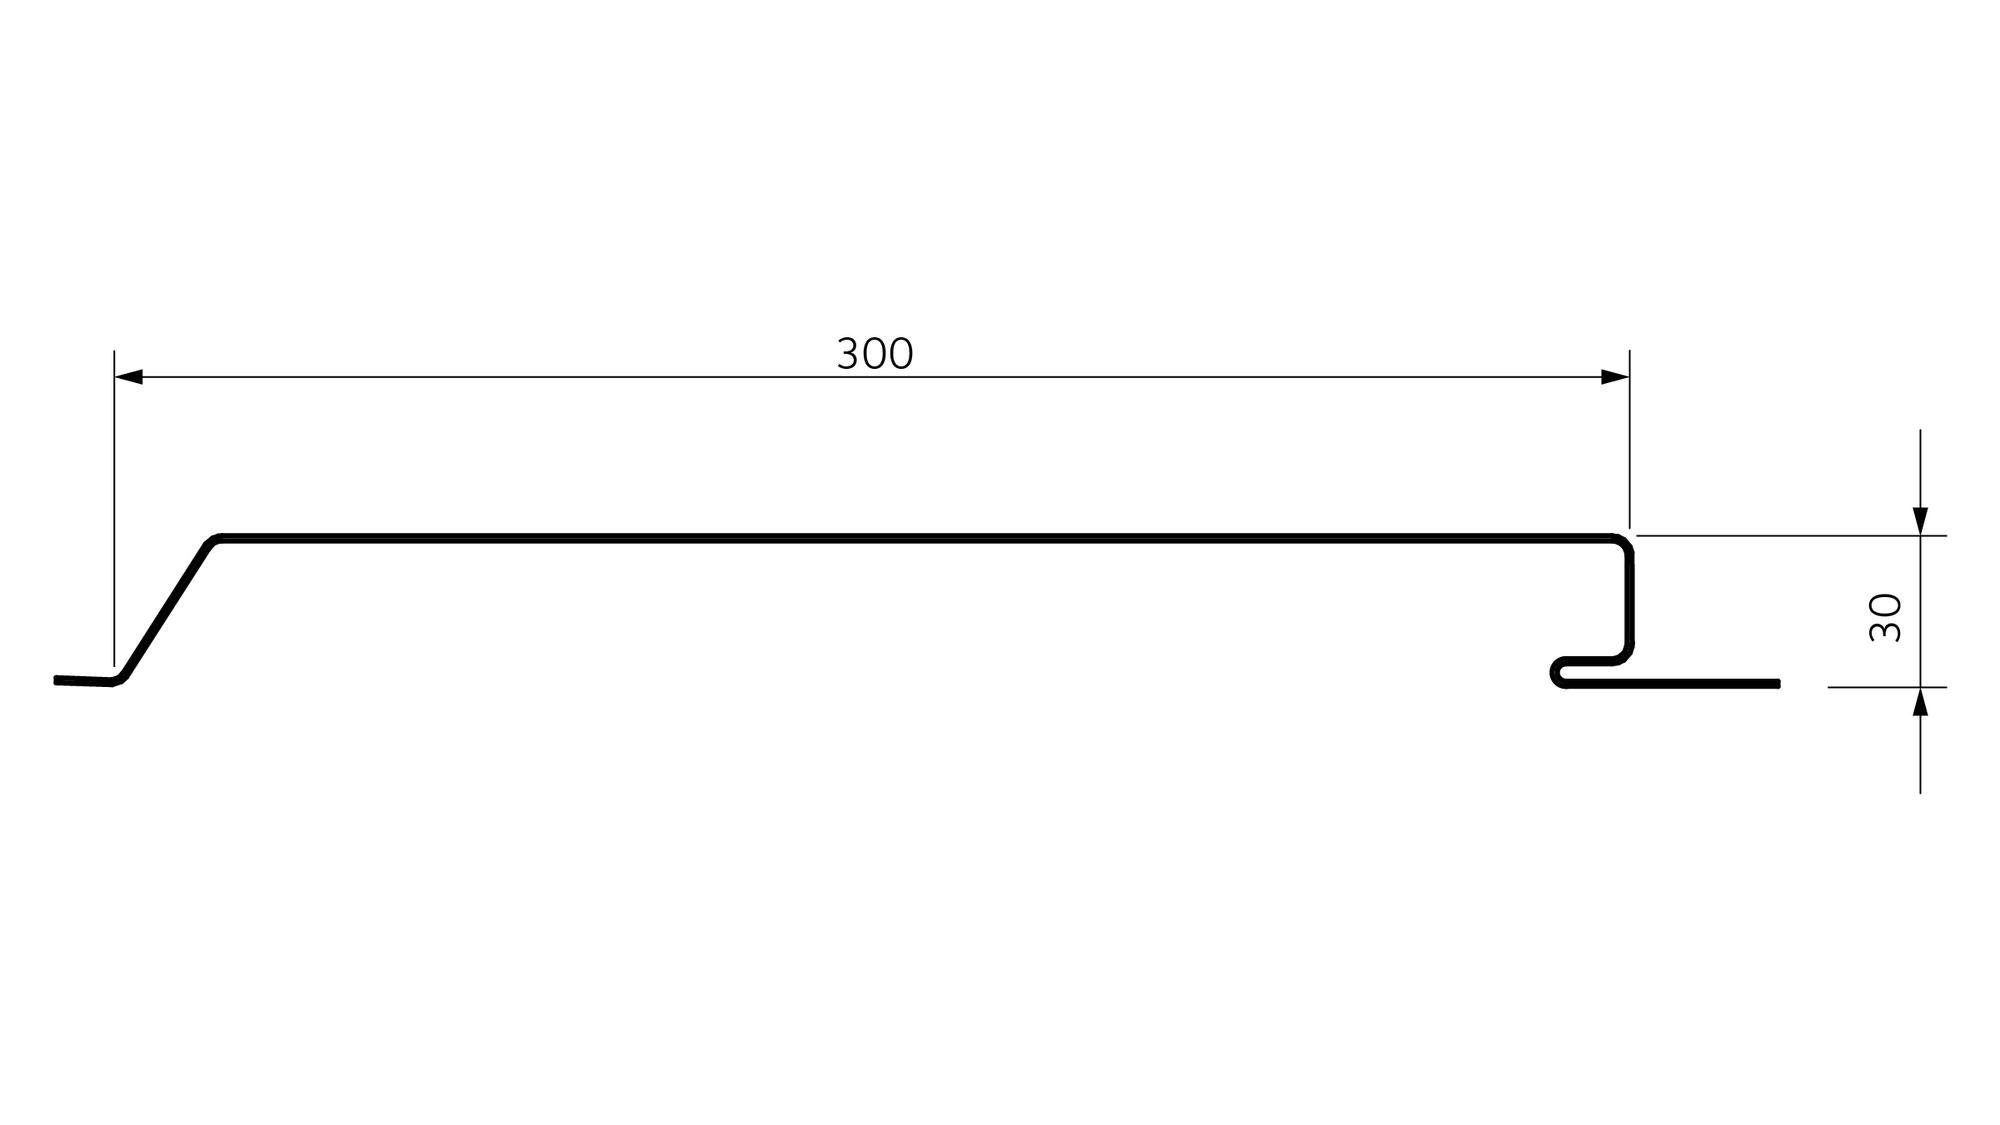 ST300 type JCB